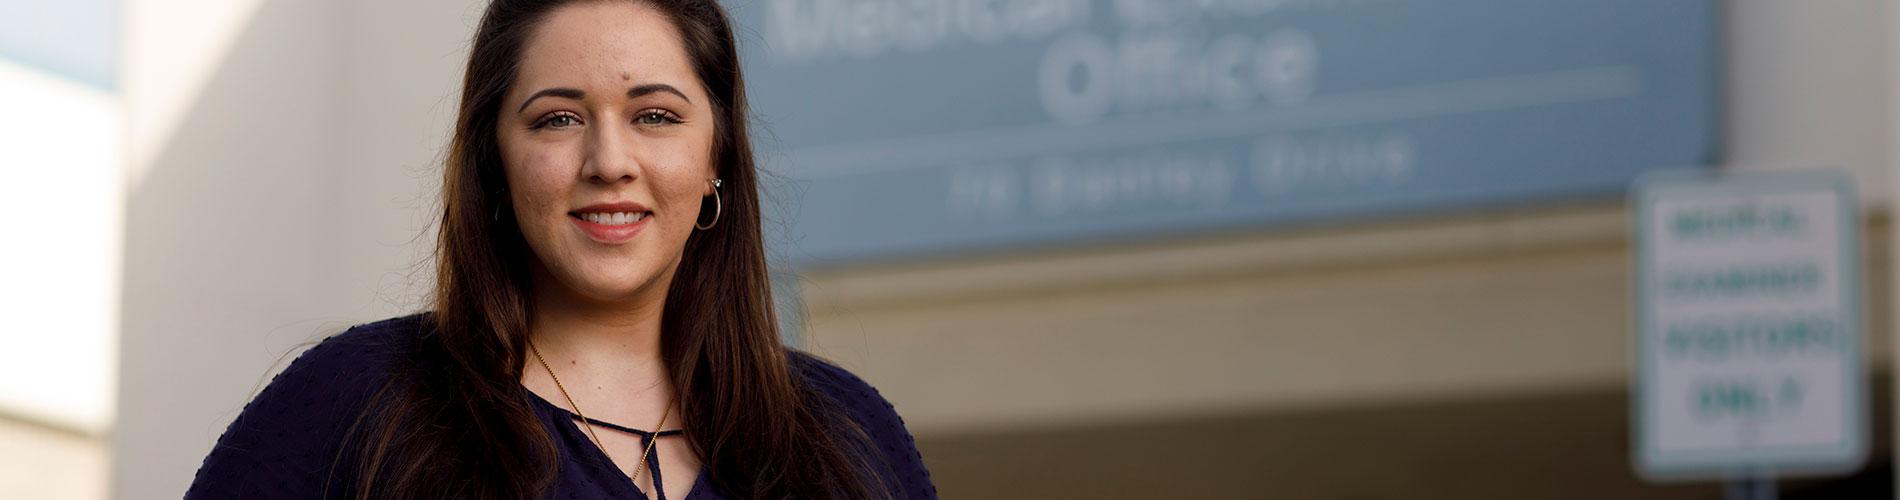 Jessica Vena - Medical Examiner